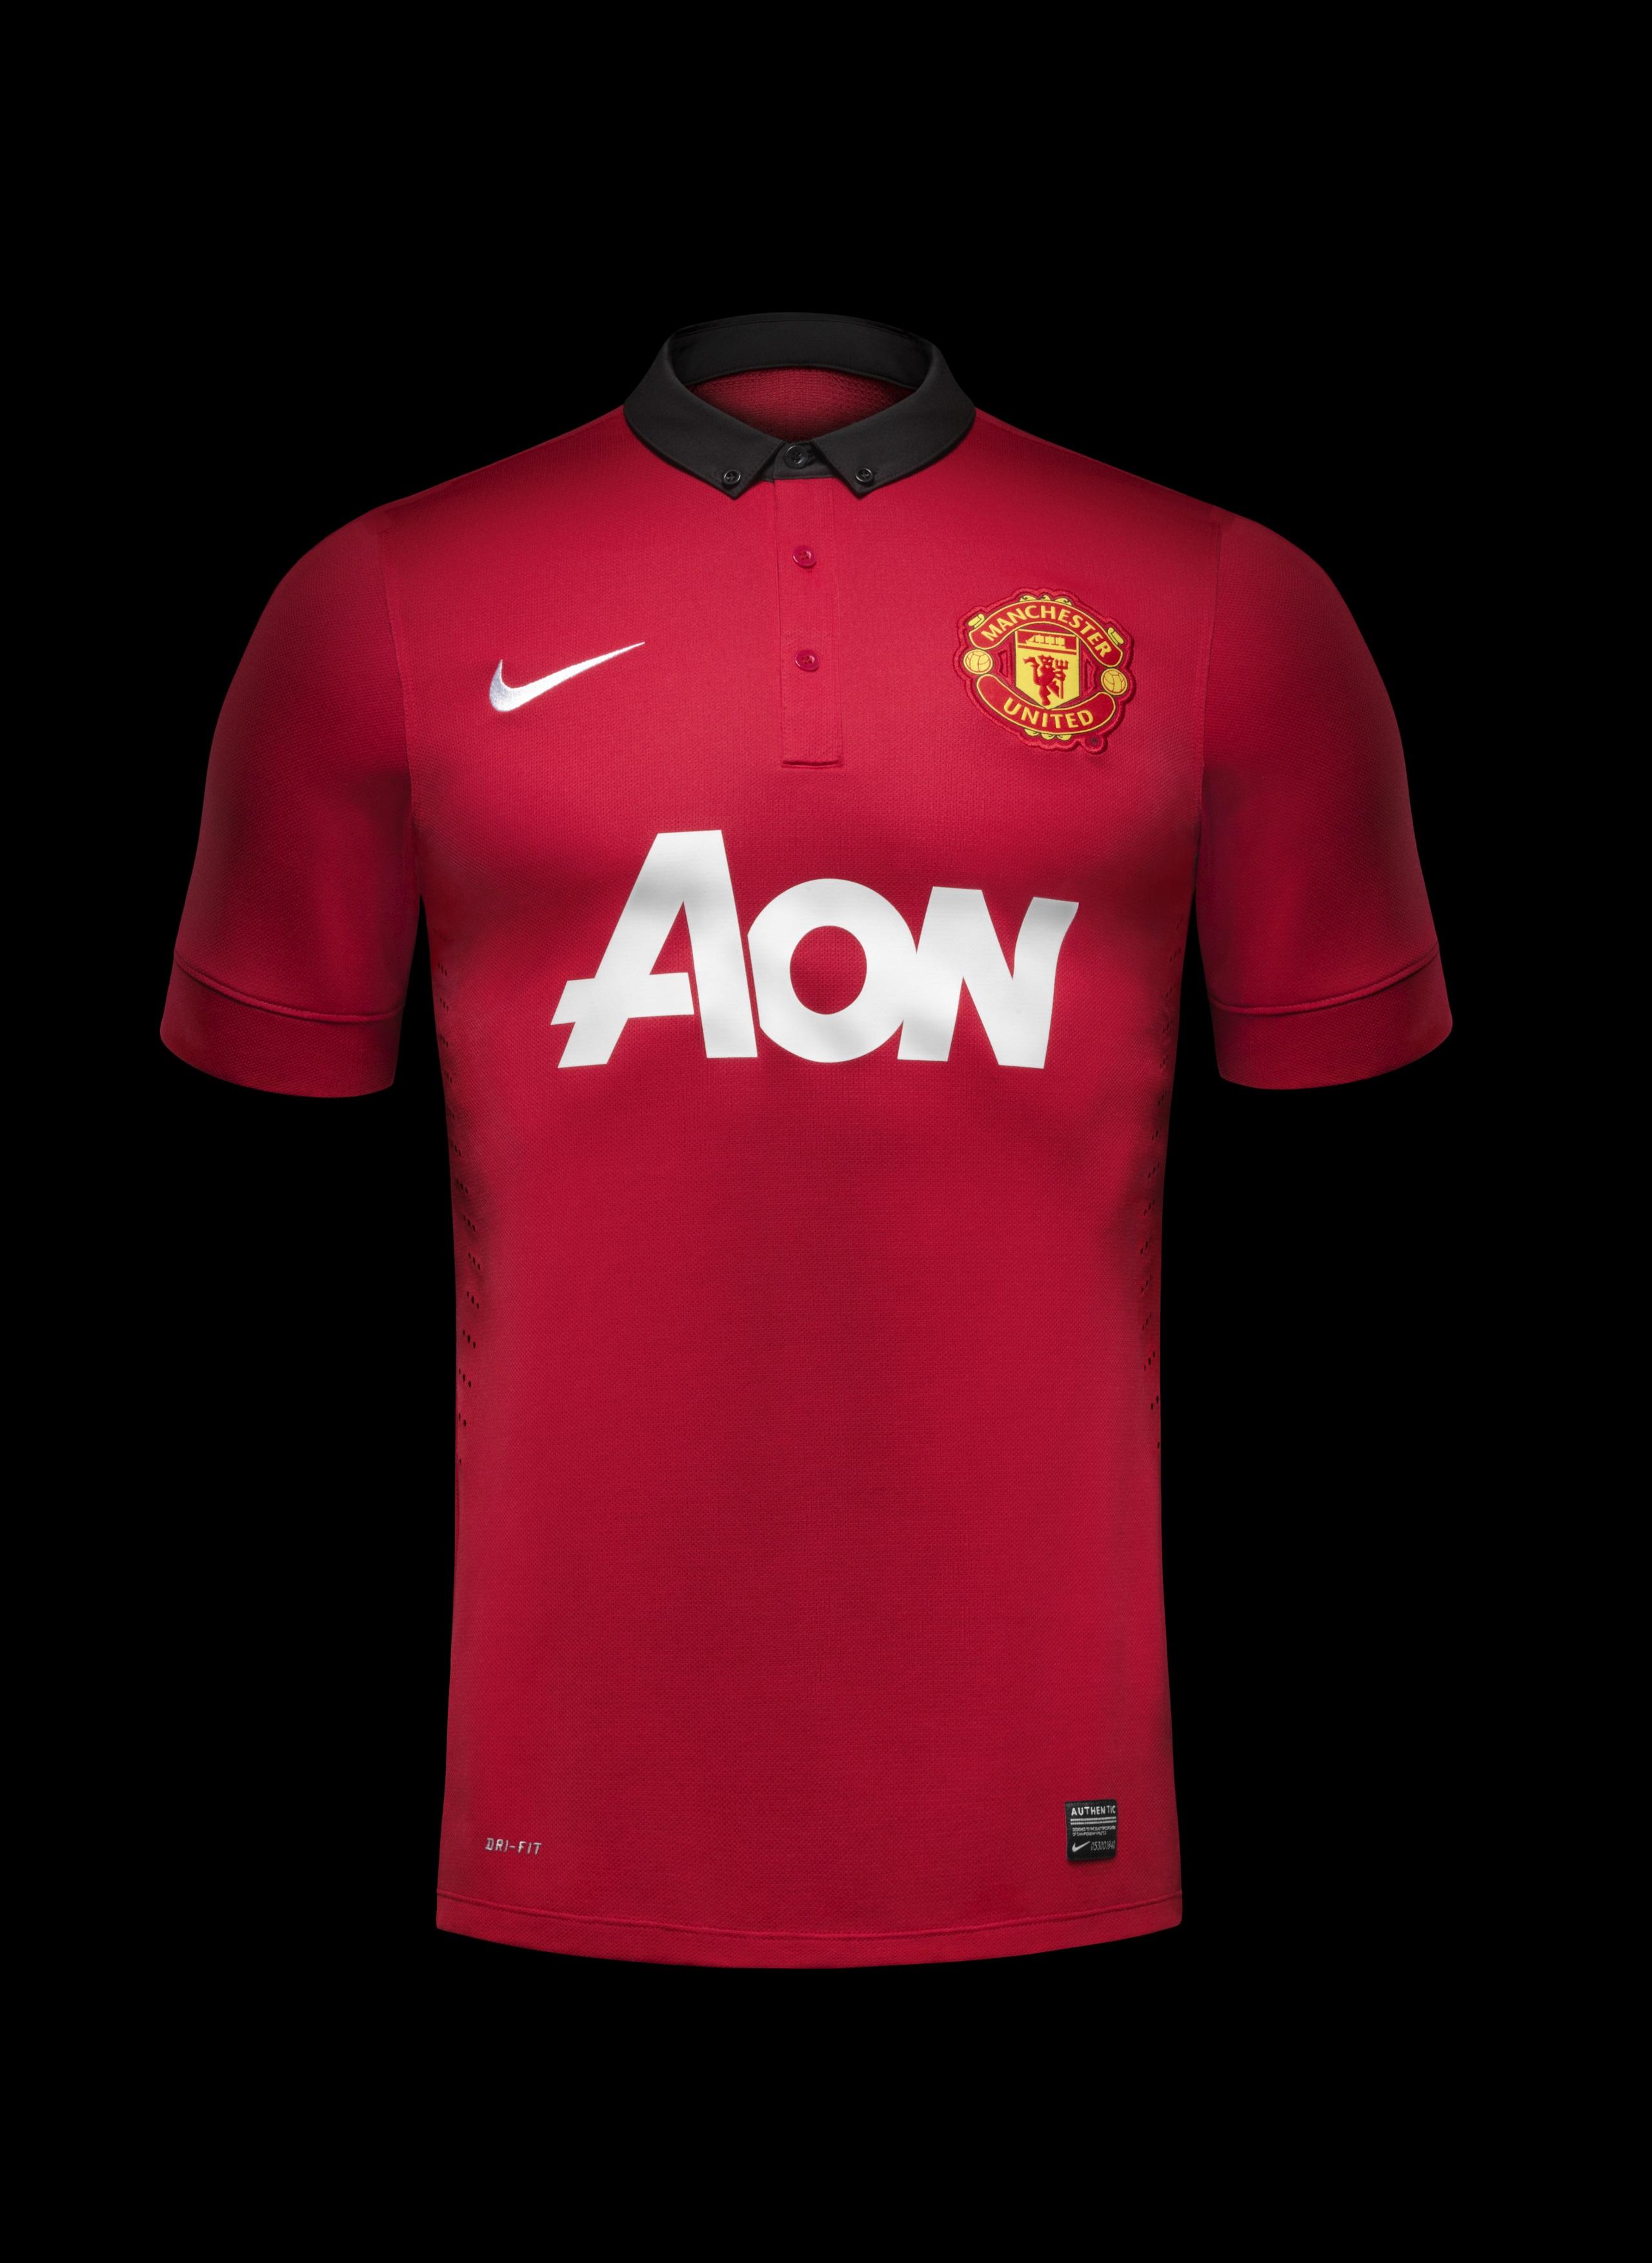 Manchester United 2013-14 home kit - Shirt